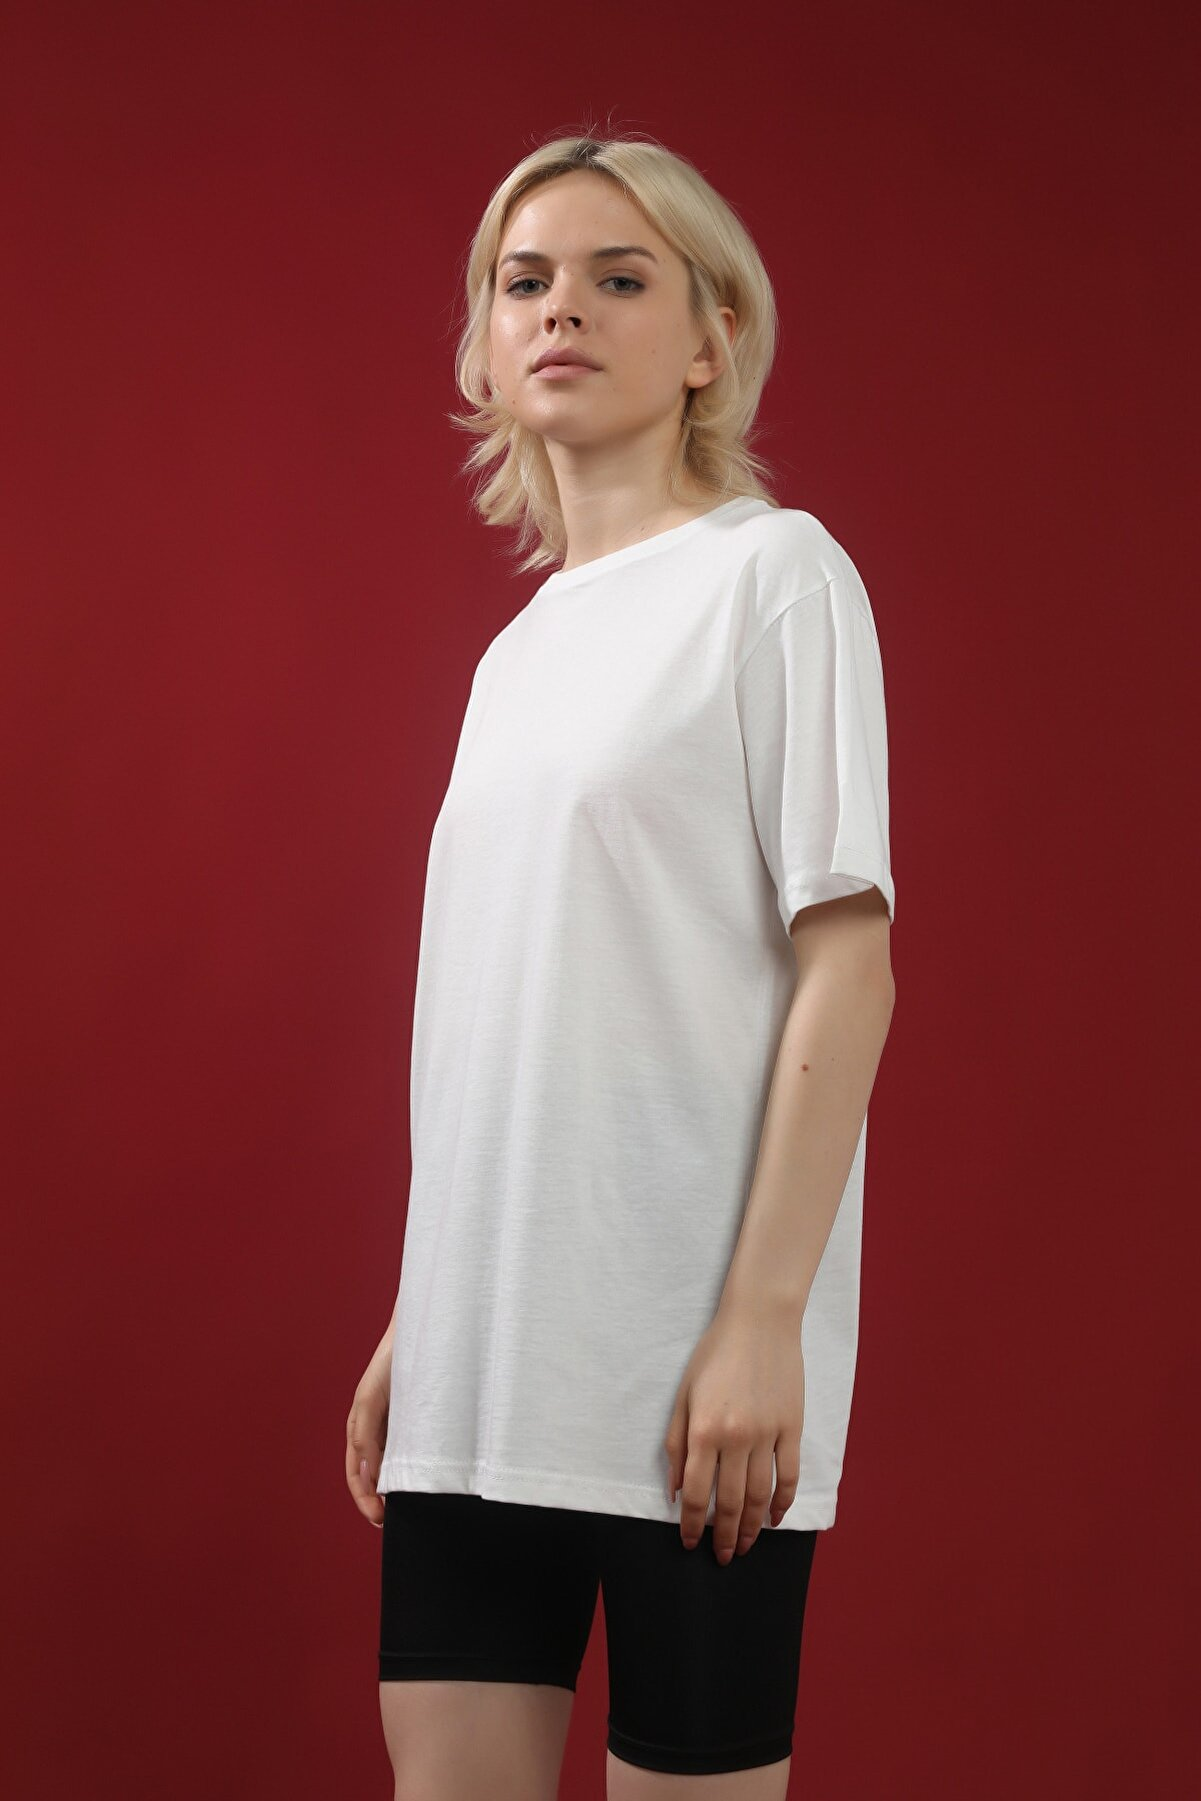 Grenj Fashion Kadın Beyaz Pamuk Bisiklet Yaka Boyfriend Örme Tshirt